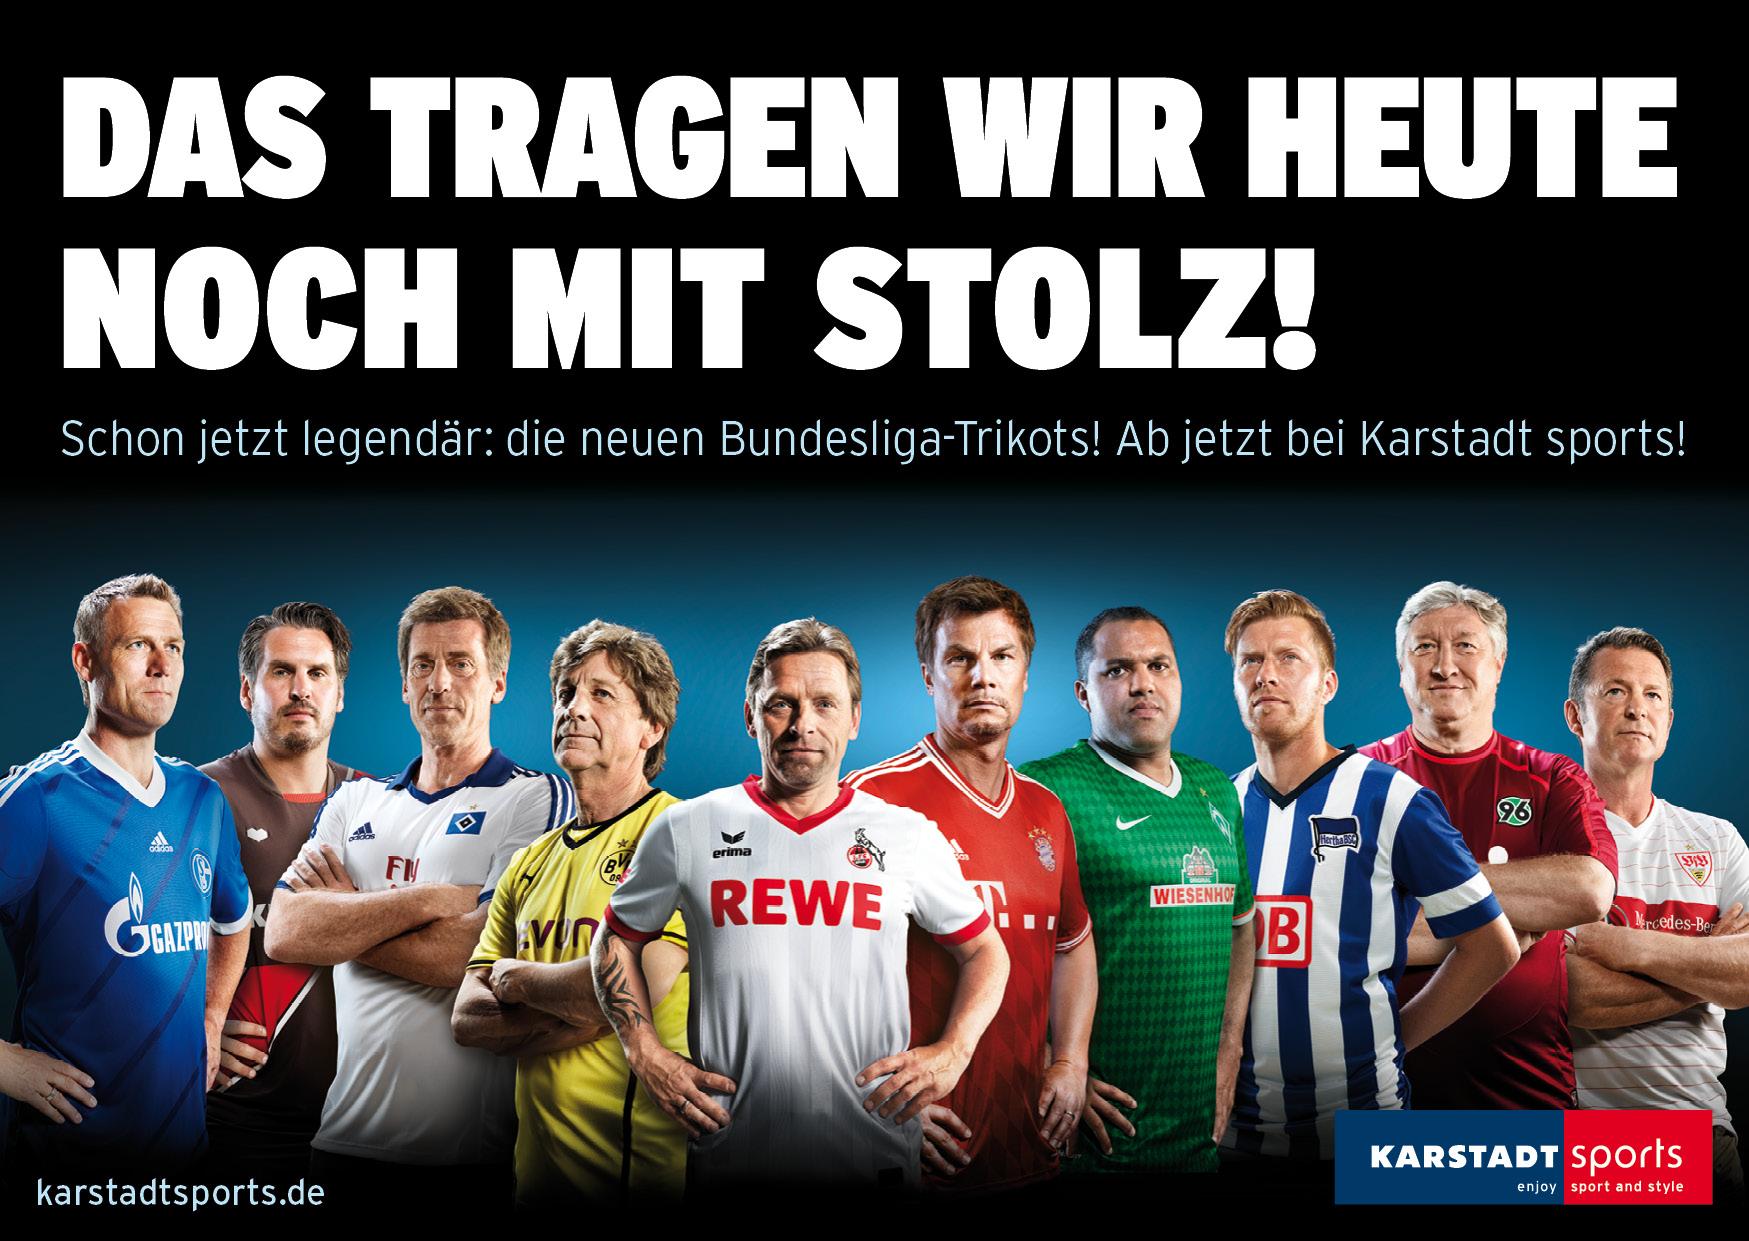 obs/Karstadt sports